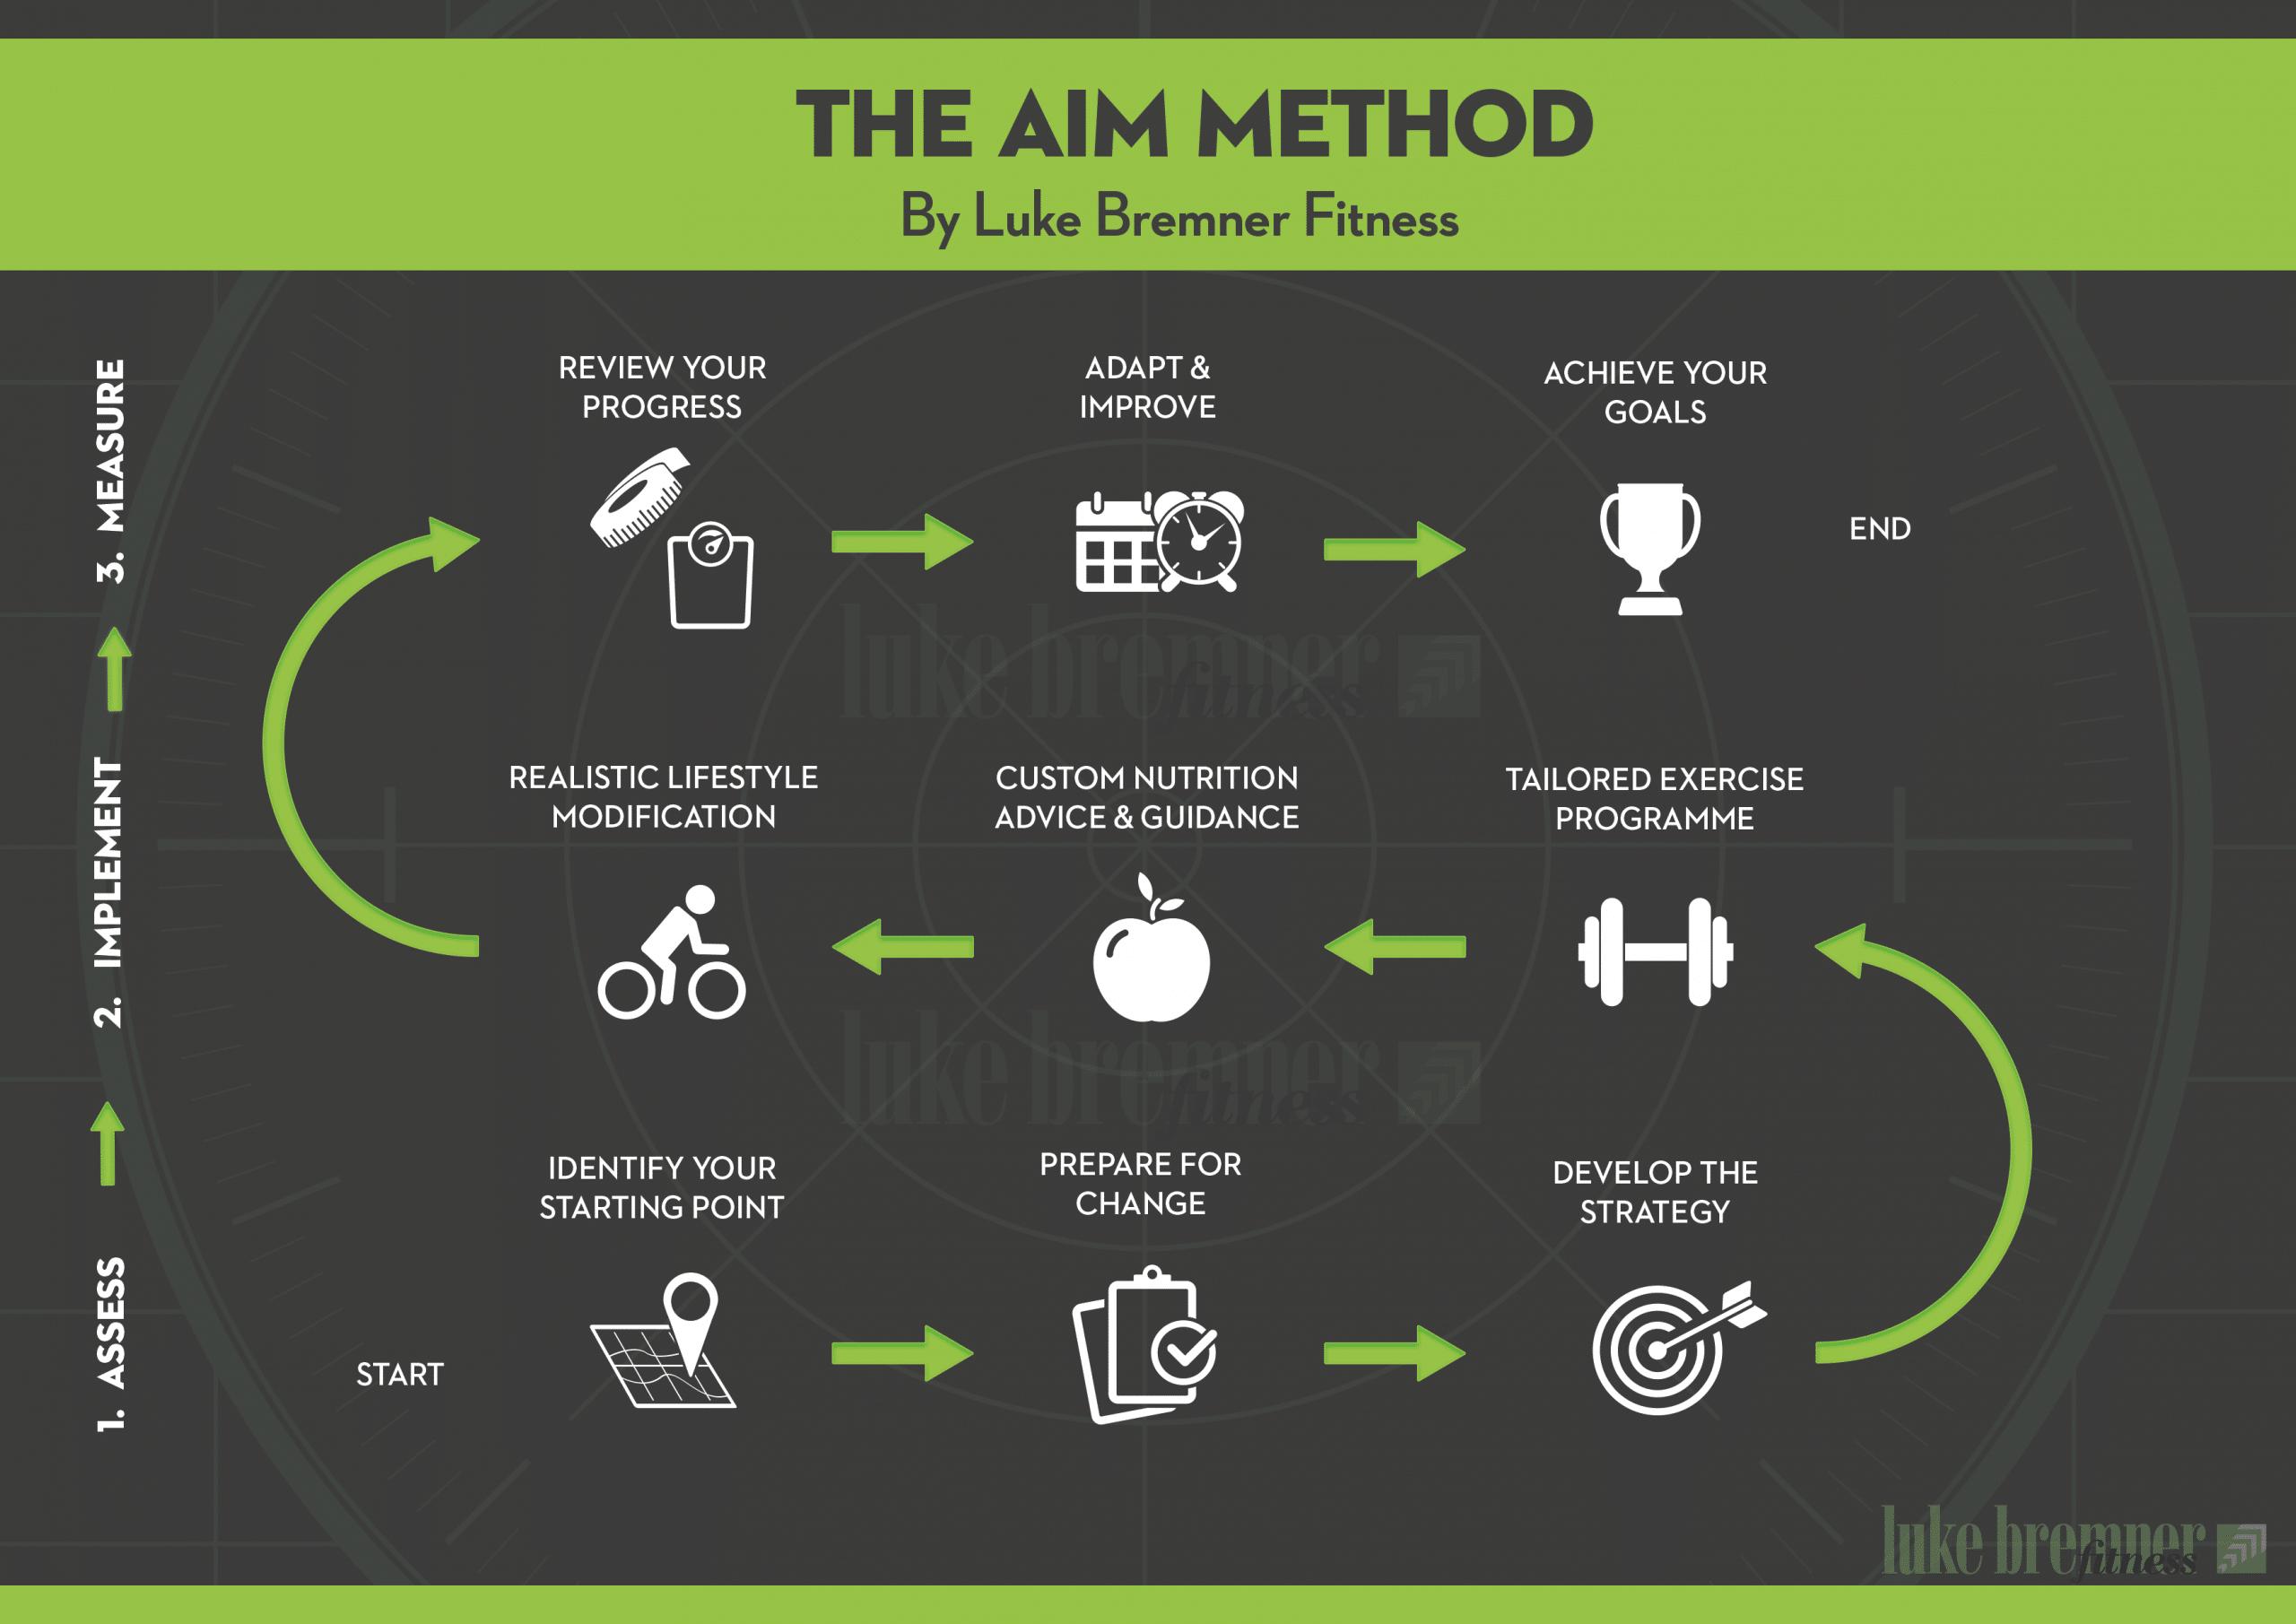 Luke Bremner Fitness - Personal Trainer Edinburgh - Aim Method Diagram